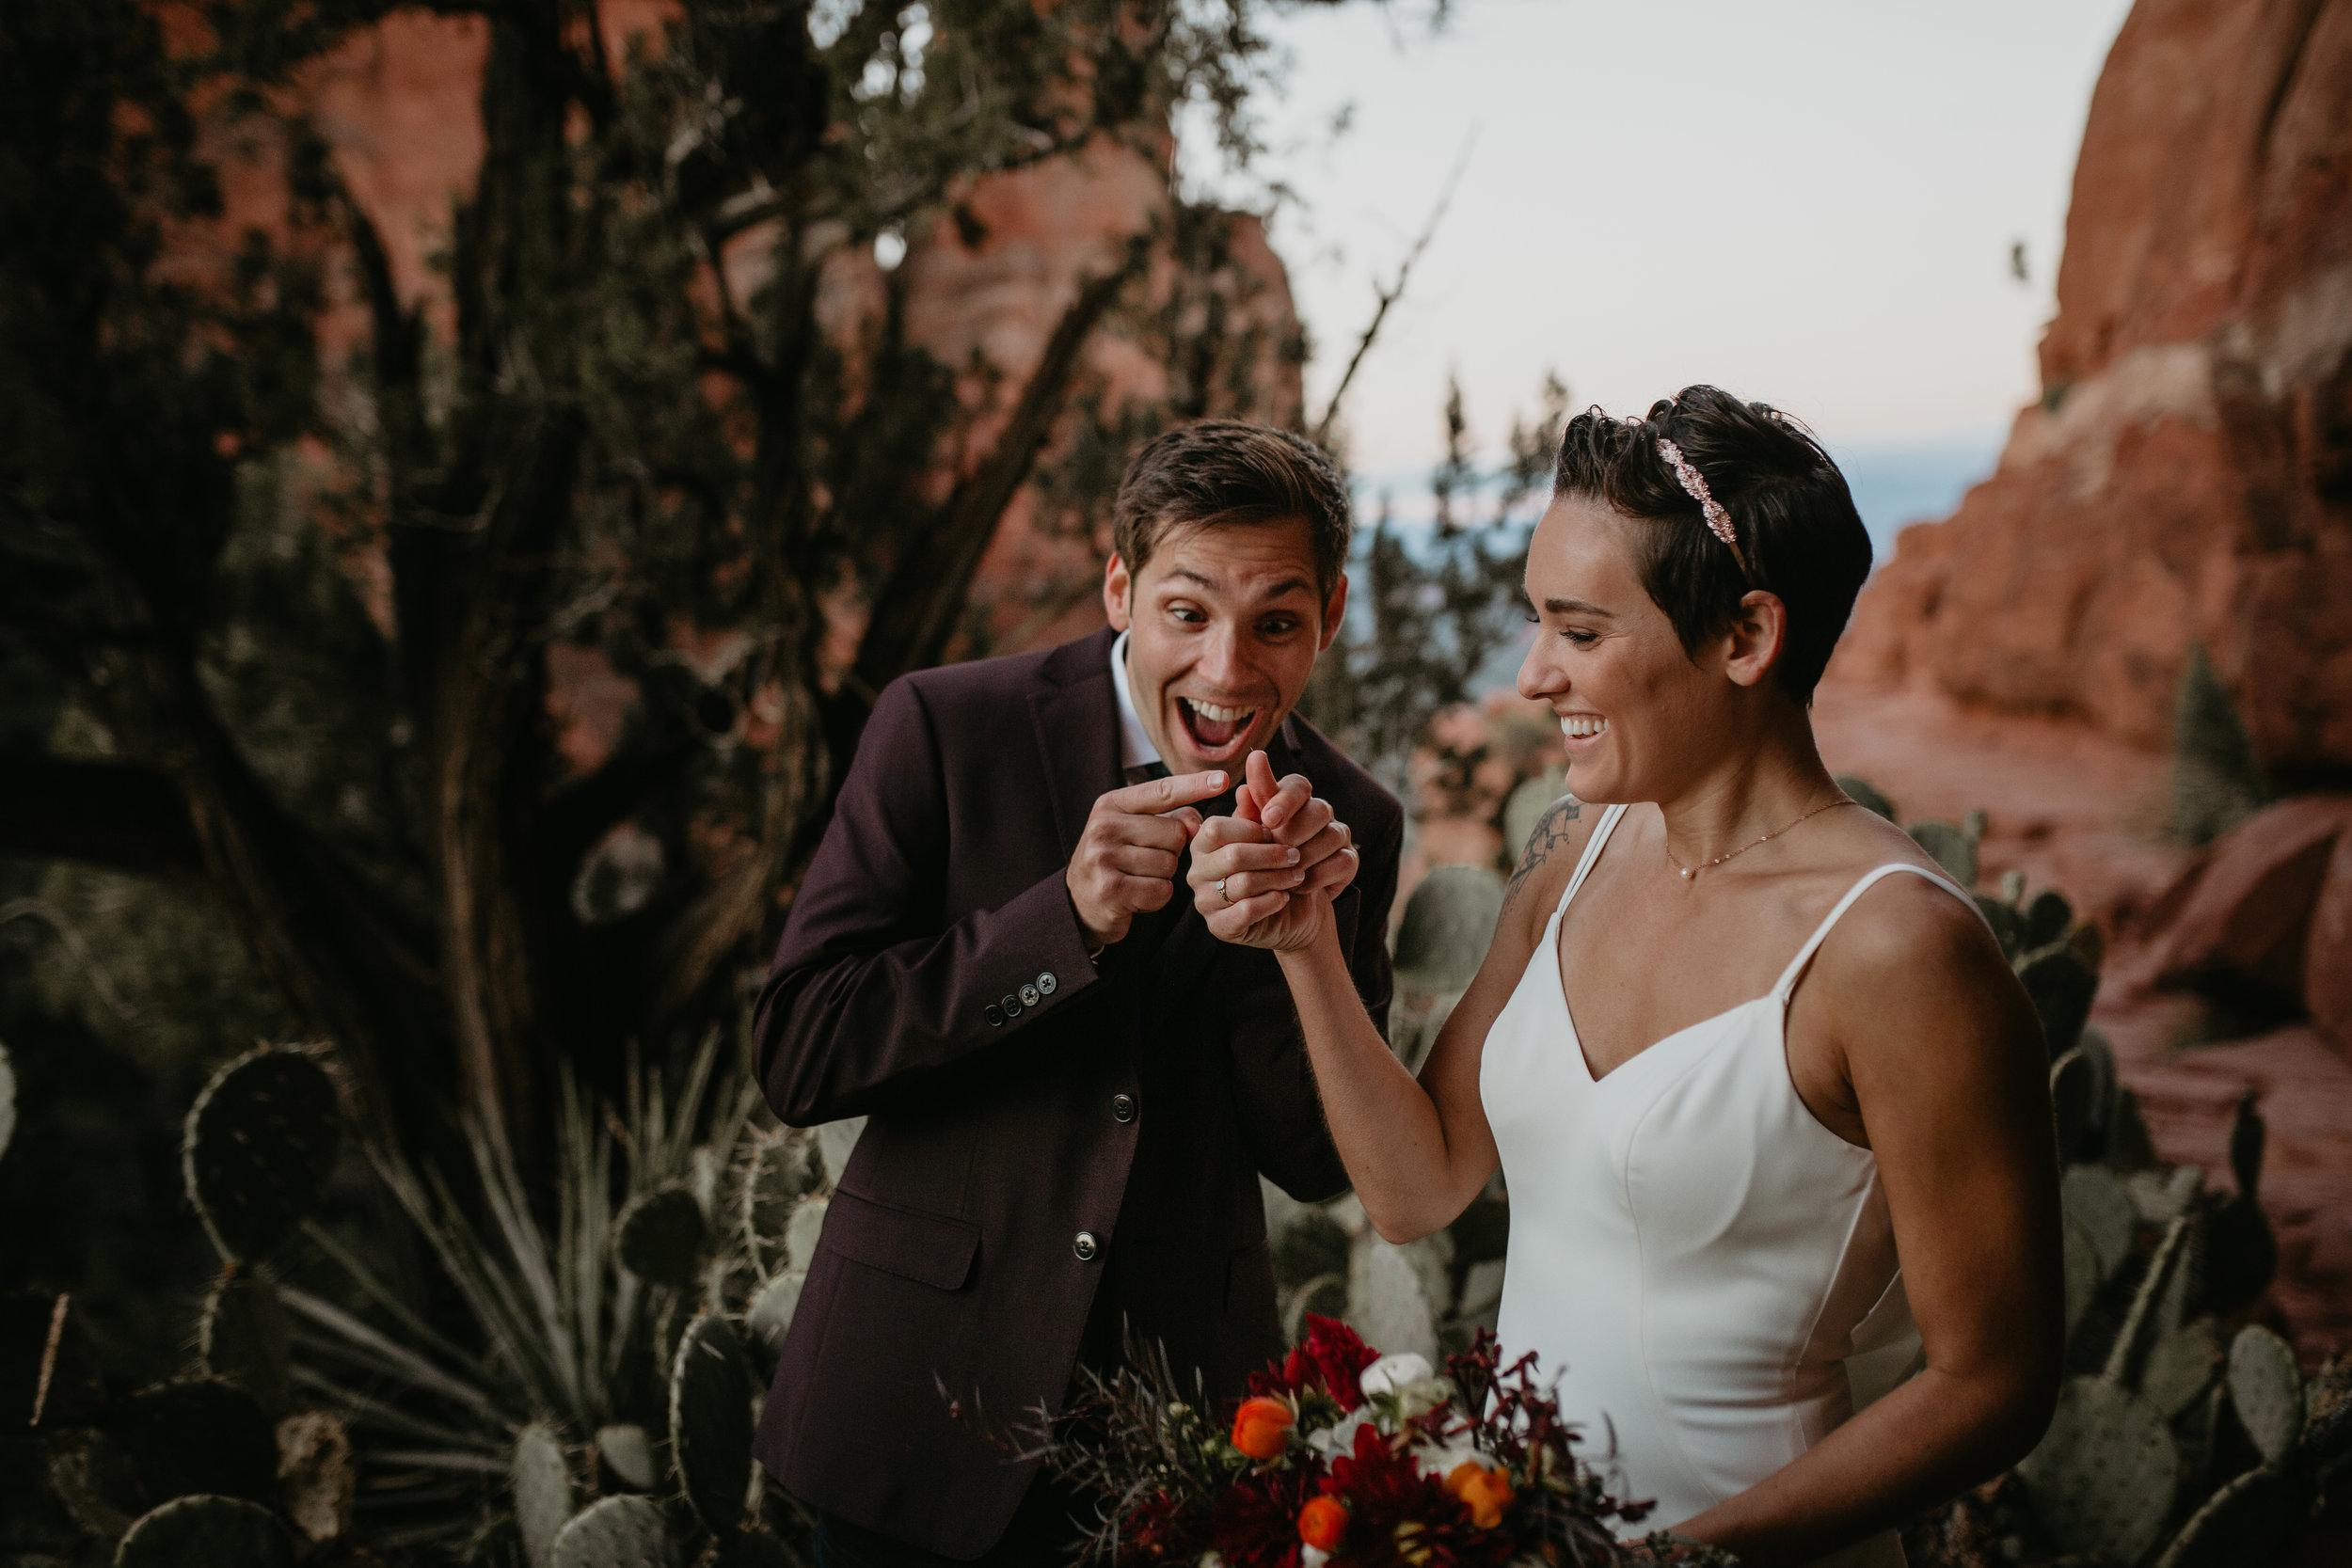 nicole-daacke-photography-sedona-arizona-destination-elopement-wedding-photographer-catherdral-rock-hiking-elopement-sedona-river-elopement-photos-desert-rock-wedding-photographer-laid-back-spontaneous-elopement-25.jpg